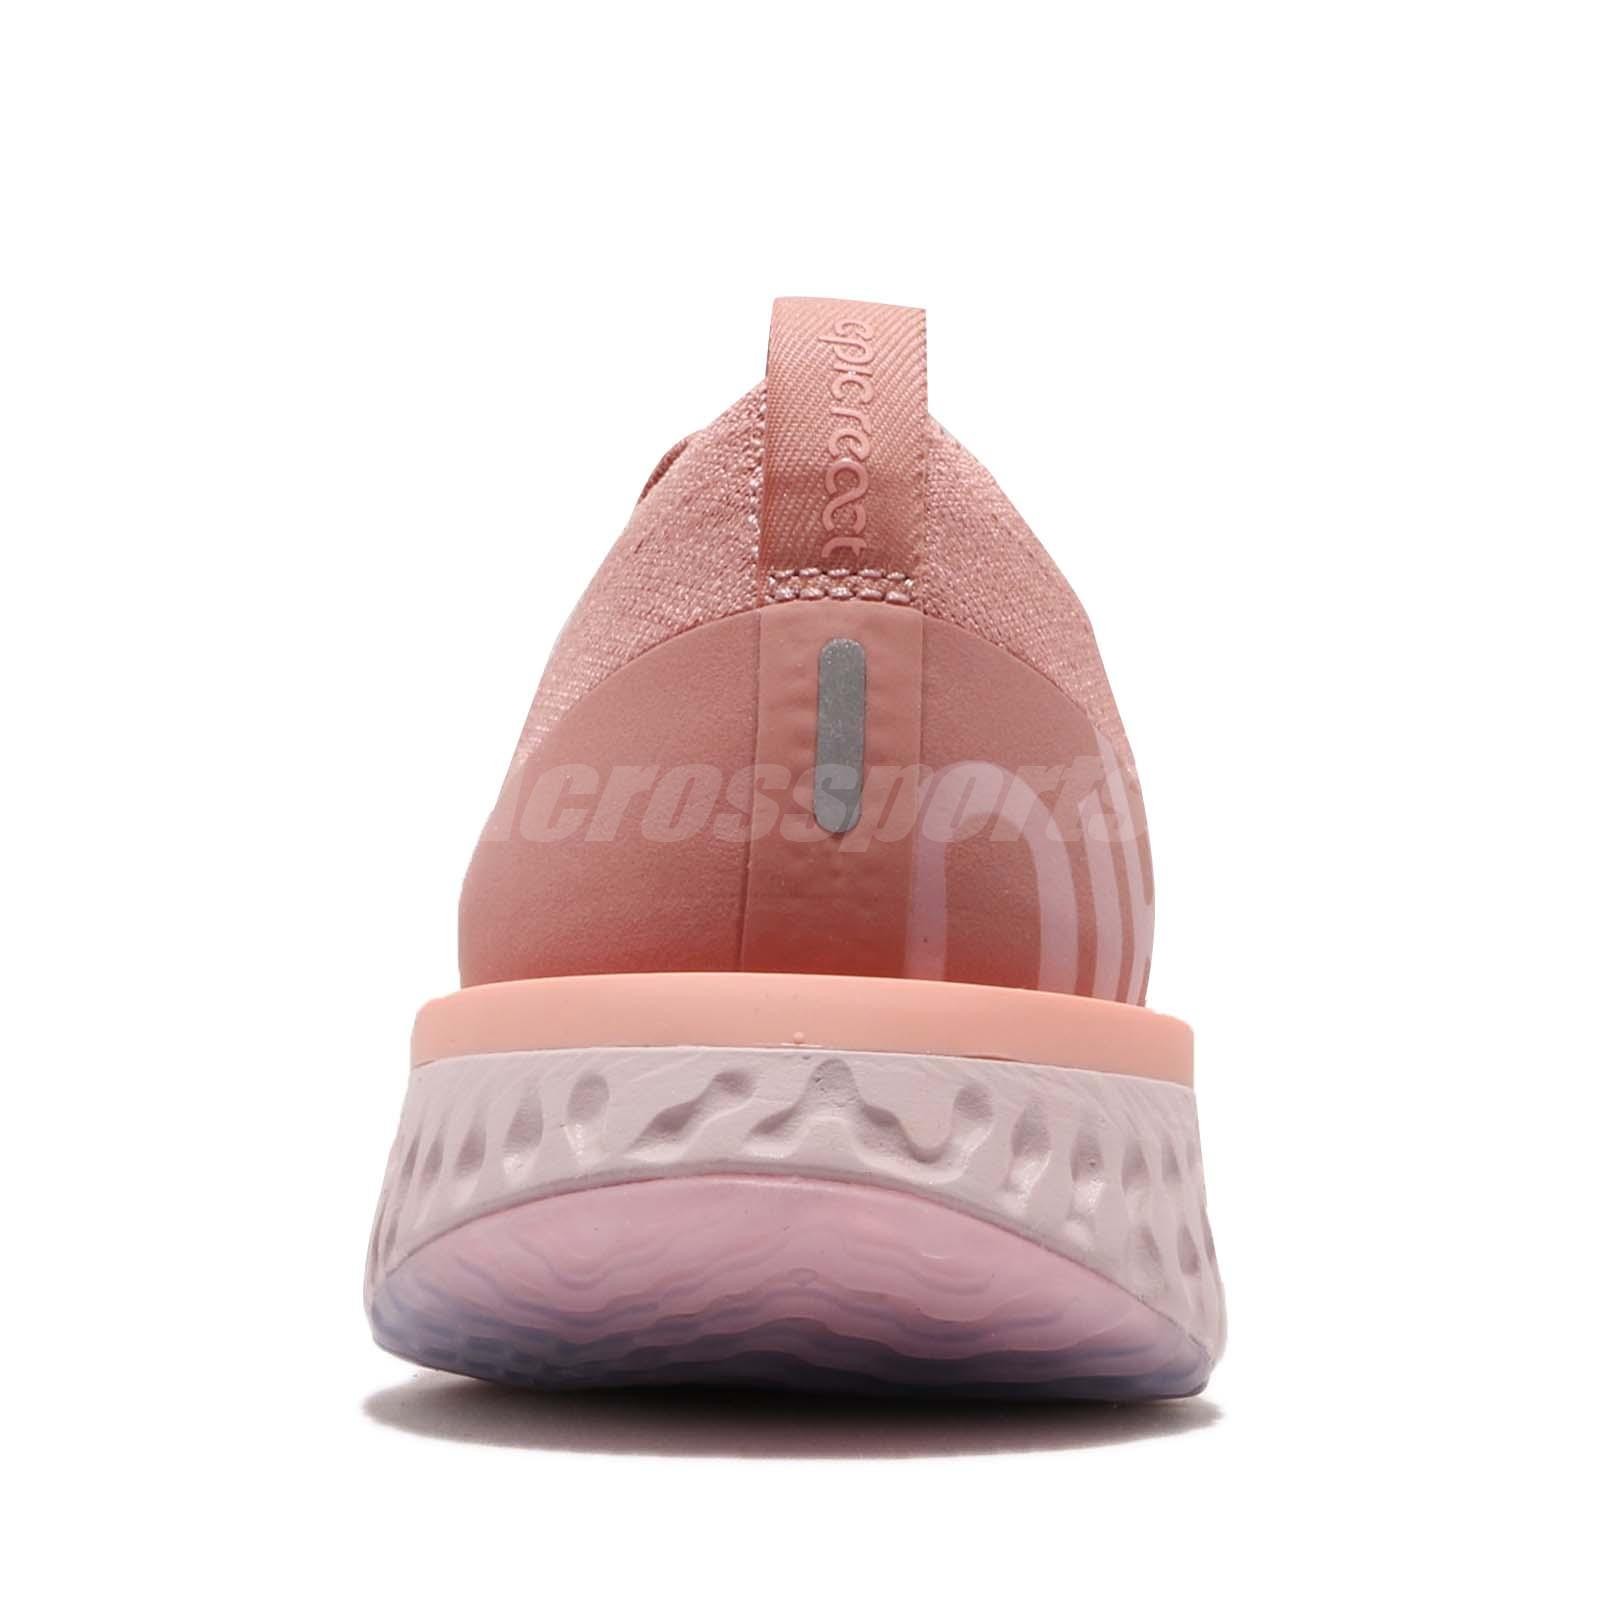 5f37249e6a90 Nike Wmns Epic React Flyknit Rust Pink Tint Women Running Shoes ...